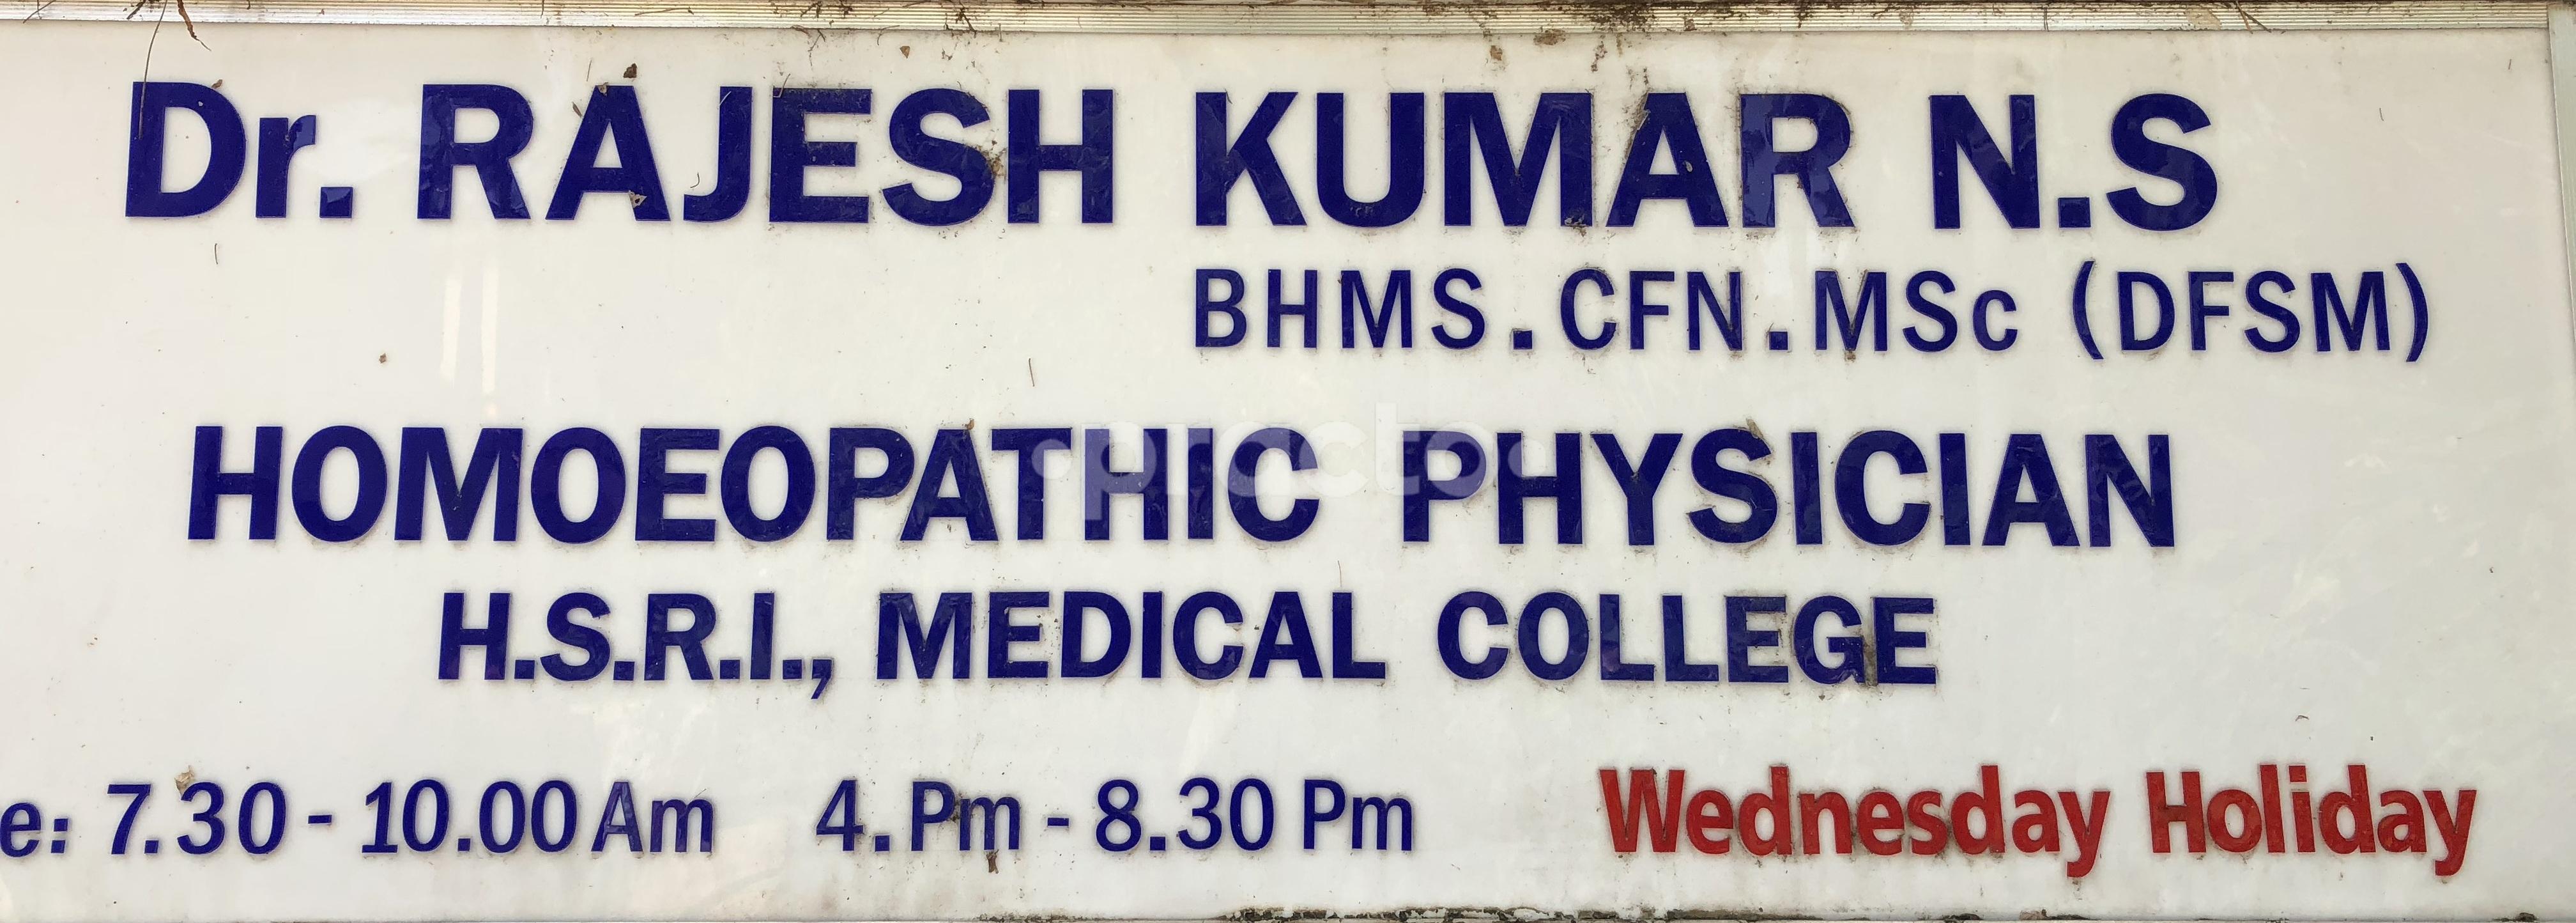 Dr. Rajesh Kumar N.S Clinic